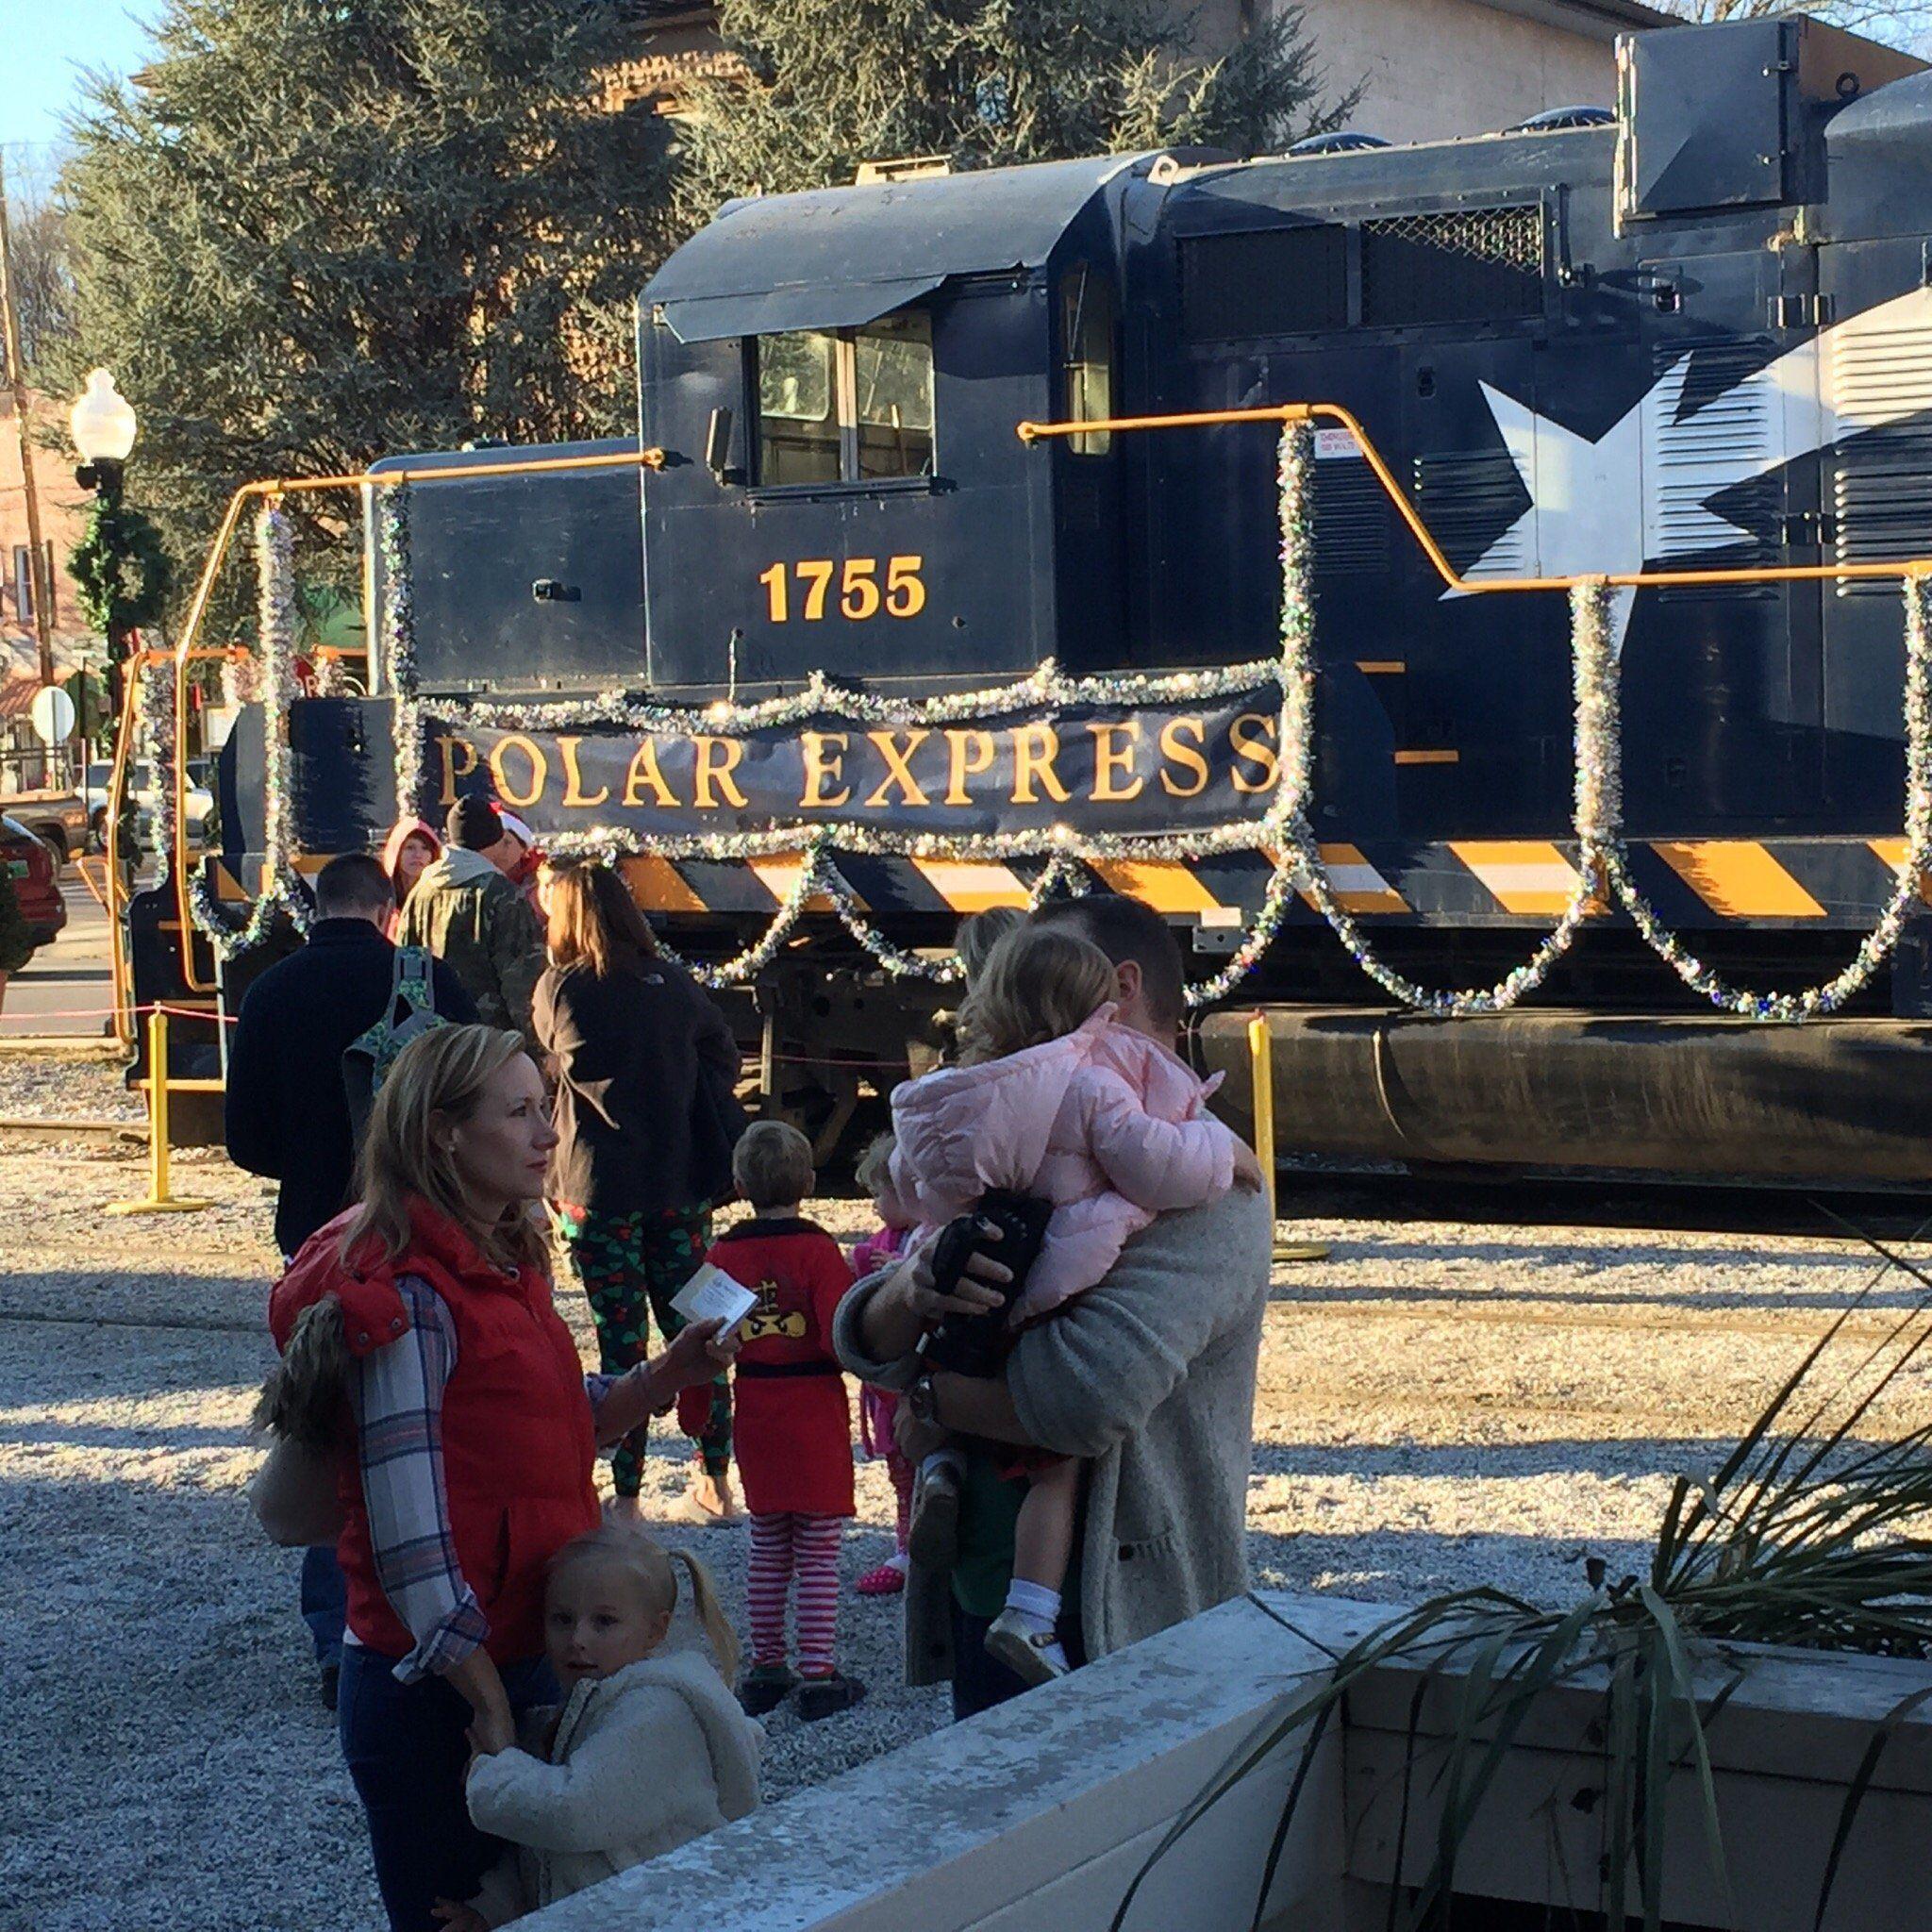 Polar Express Bryson City North Carolina Vacation Trips